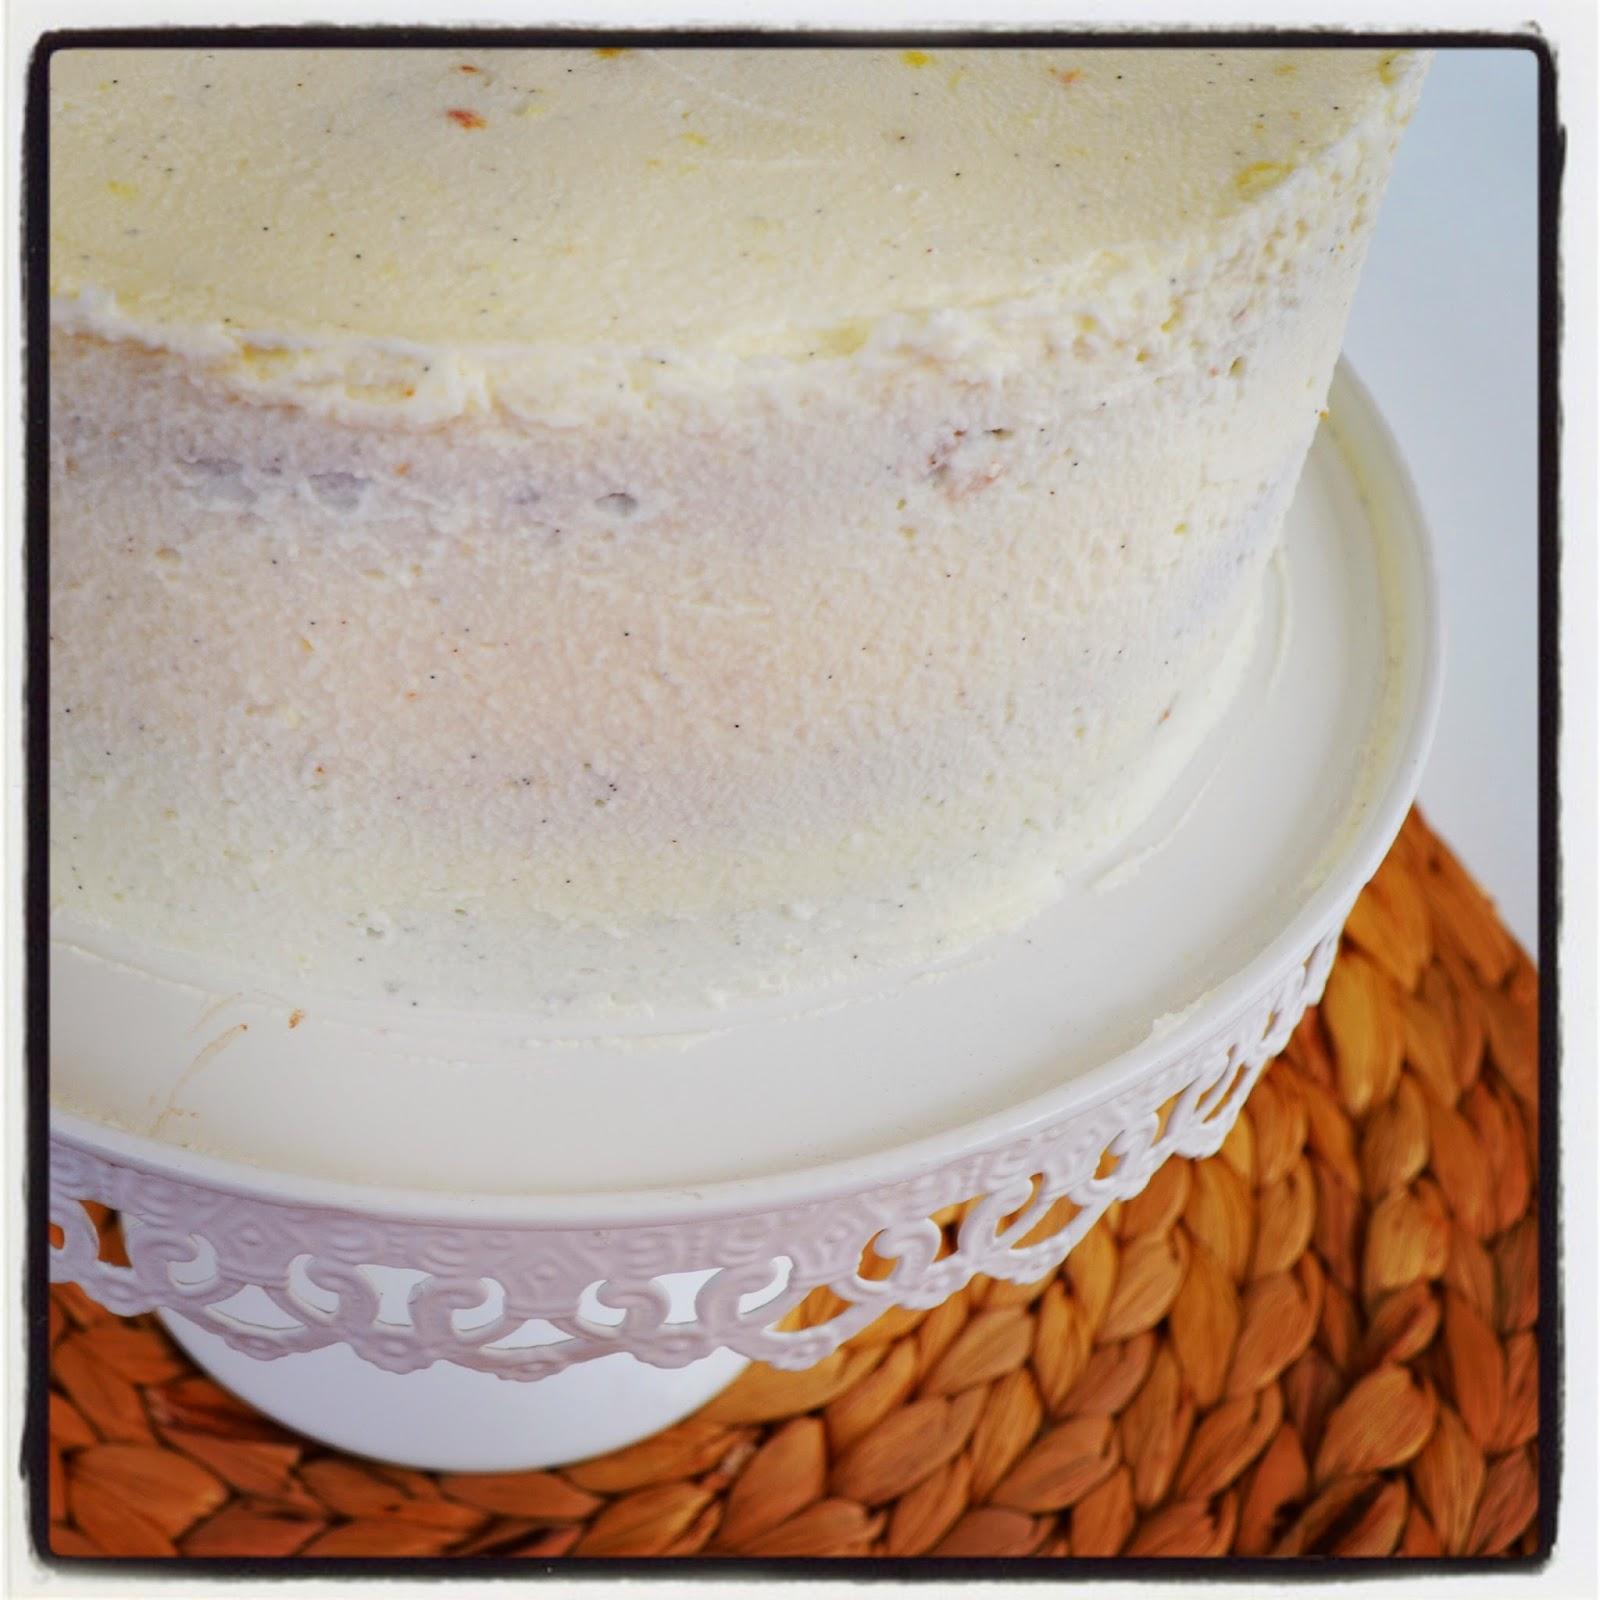 torta di Halloween, dolci di Halloween, tutorial, Cameo, Paneangeli, Leda intorta, cake design